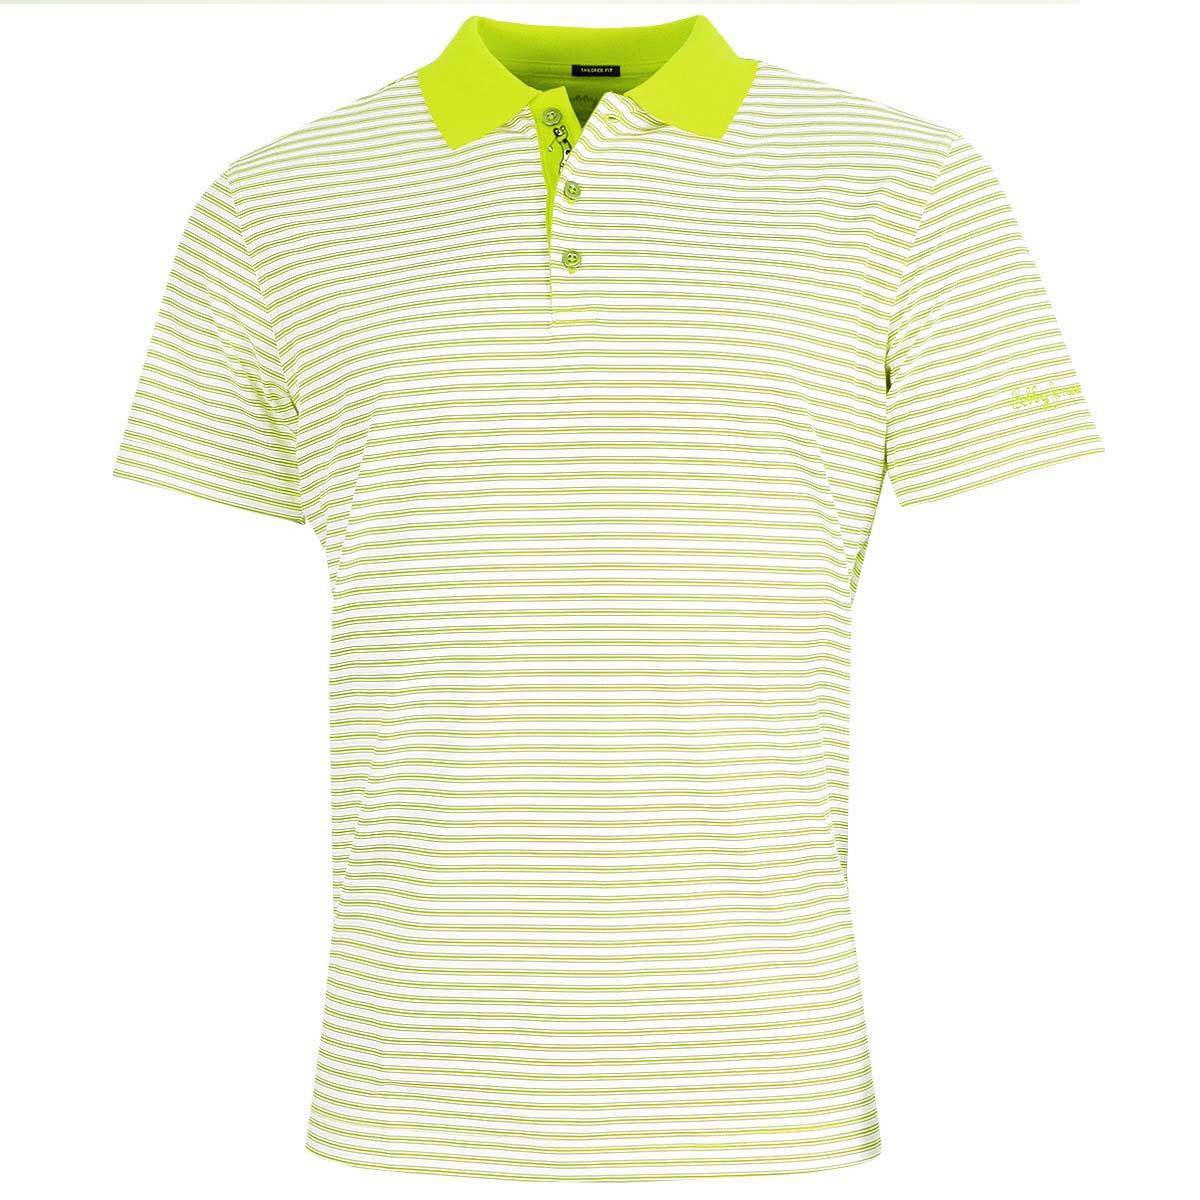 Bobby Jones Mens XH20 Frame Stripe European Fit Golf Polo Shirt 72 ...